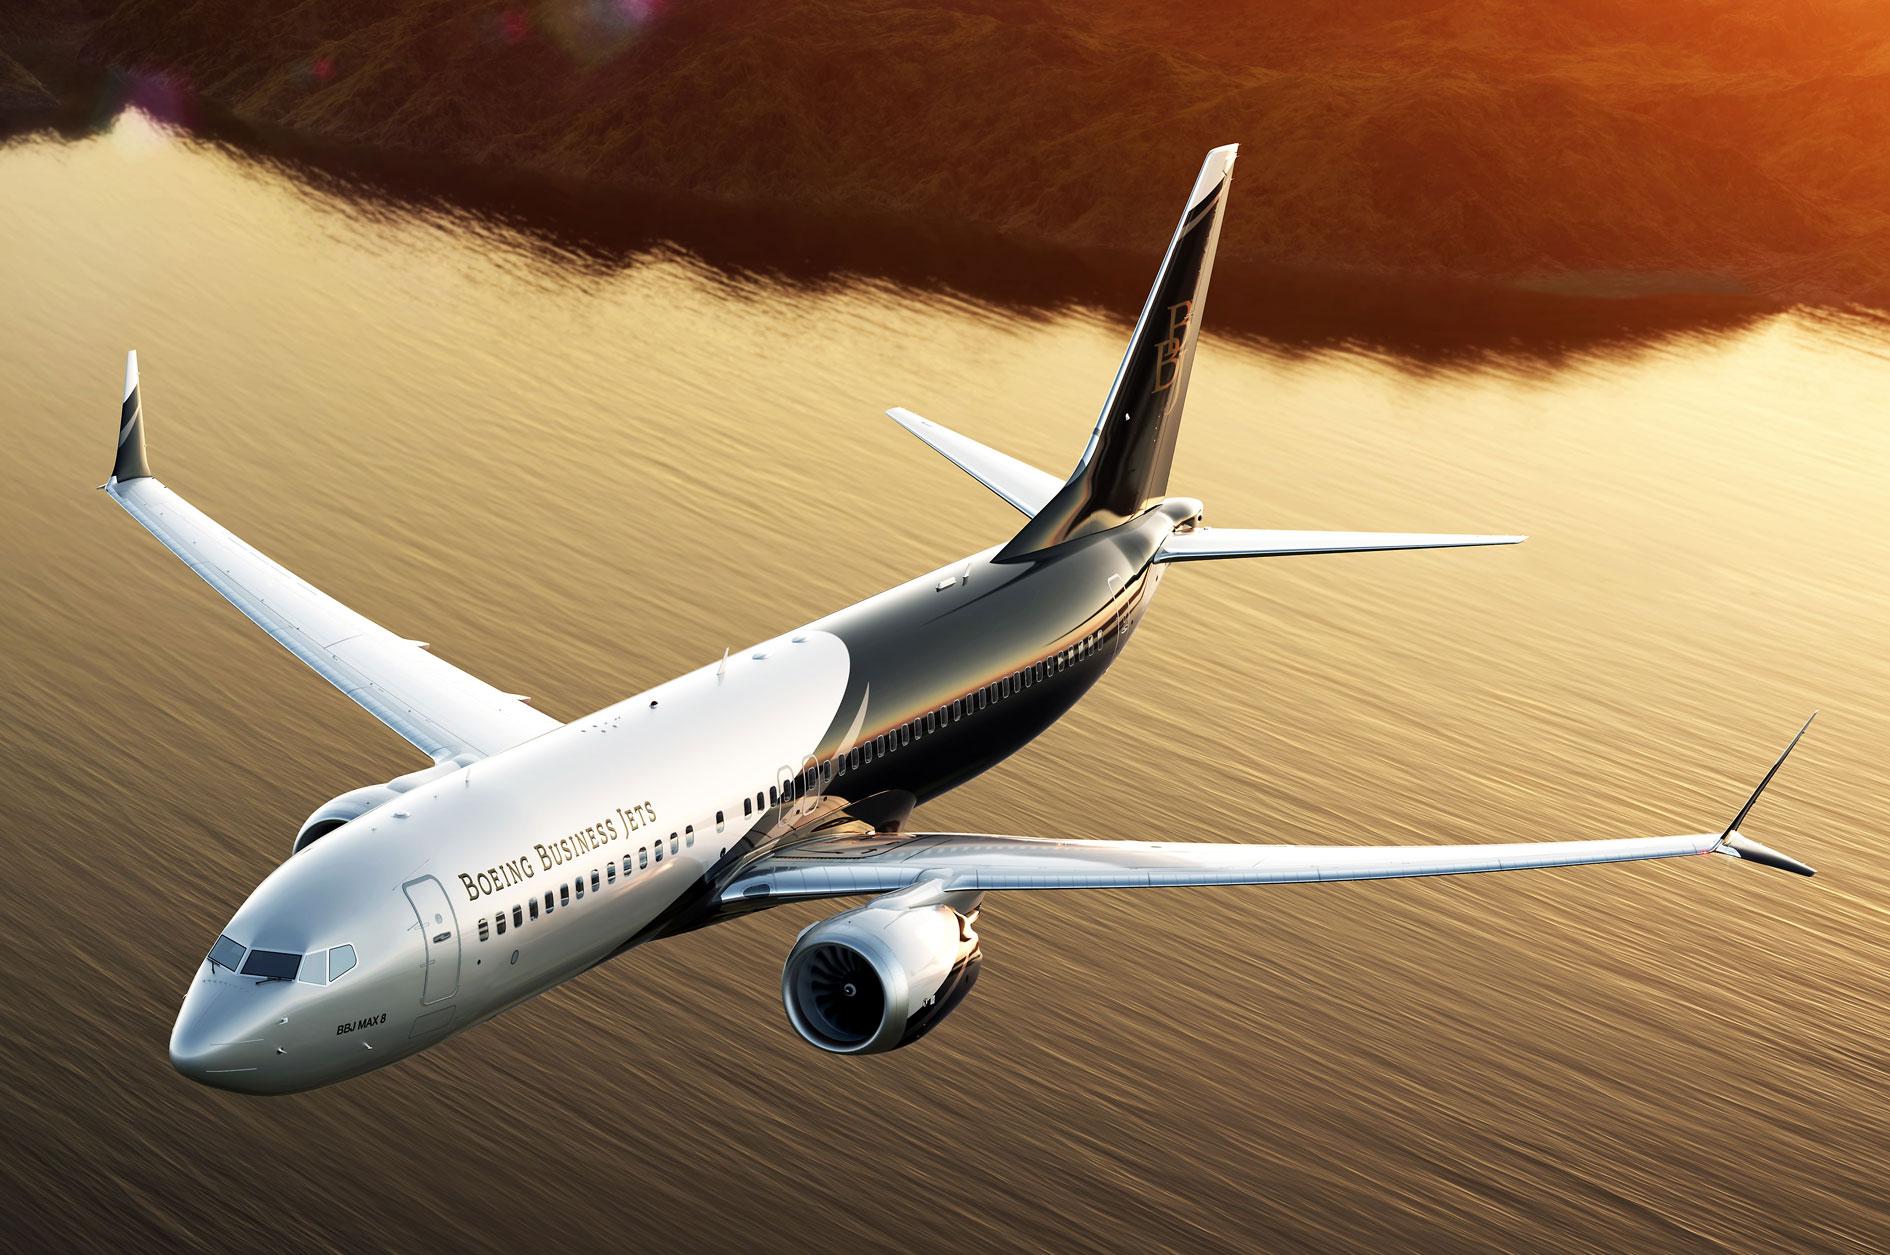 ultimate jet news bbjmax8 1 - Boeing Business Jet